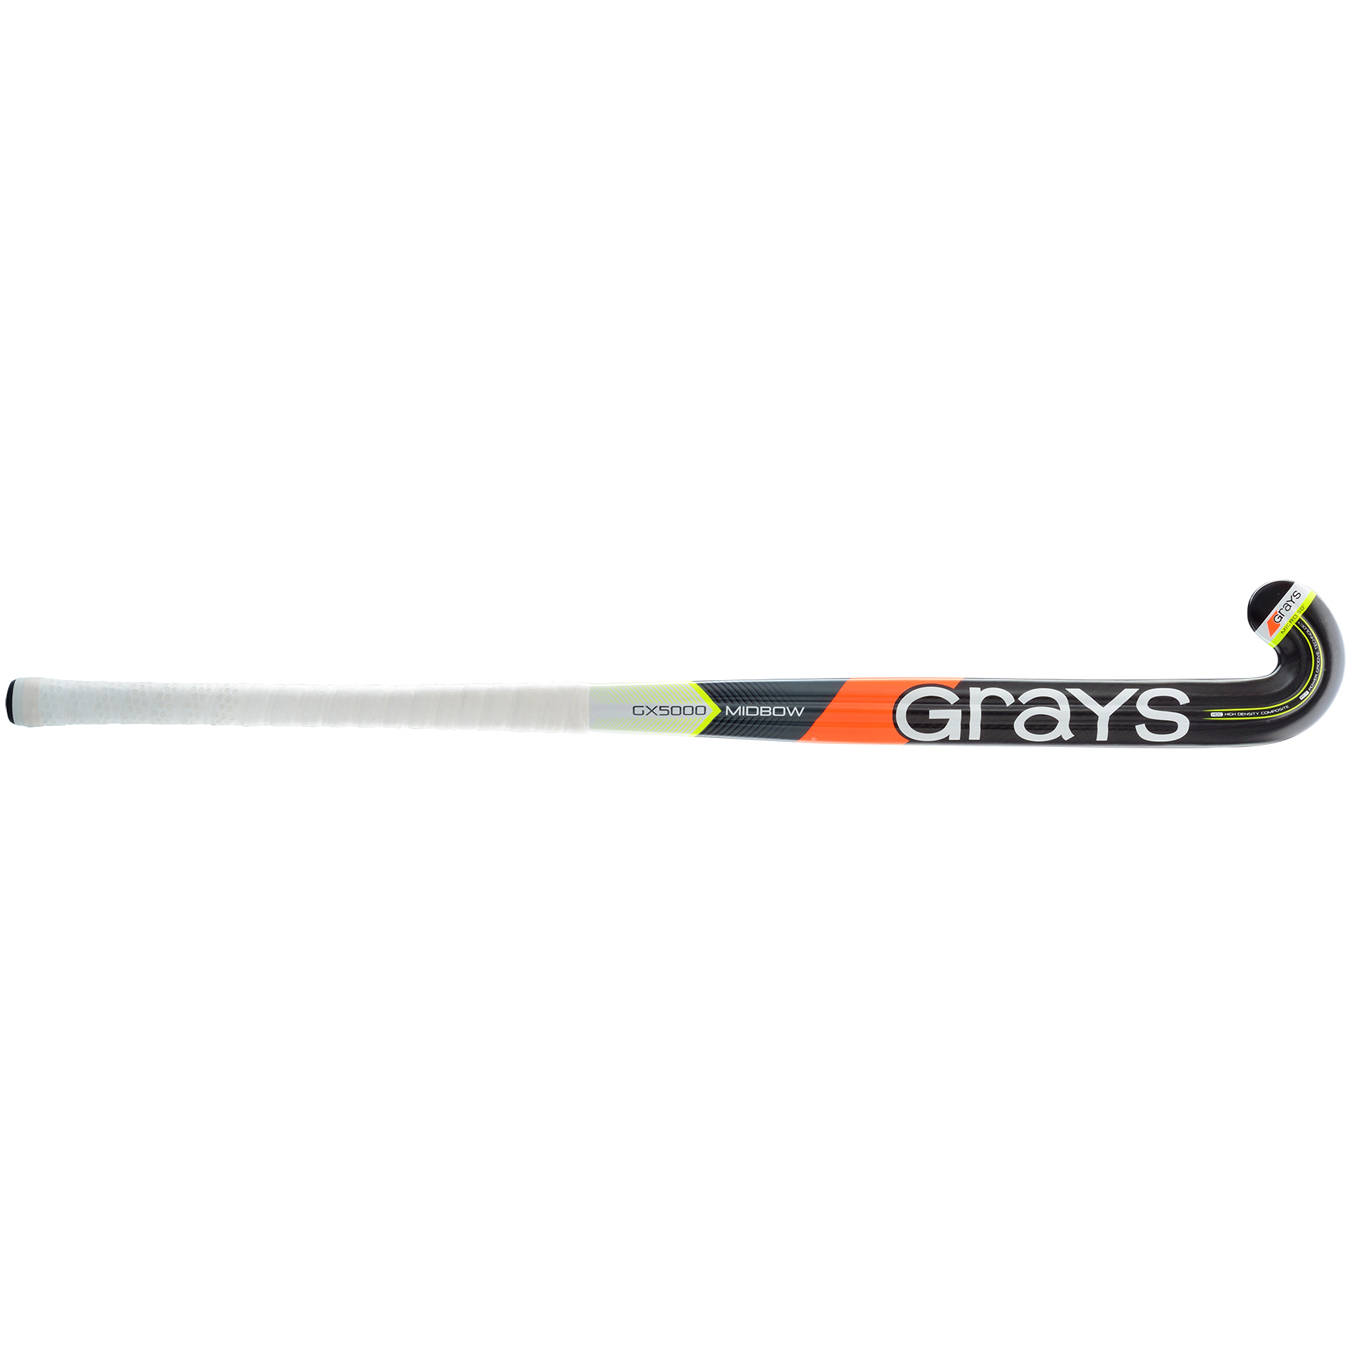 Kunstof hockeystick Grays GX5000 MB MIC